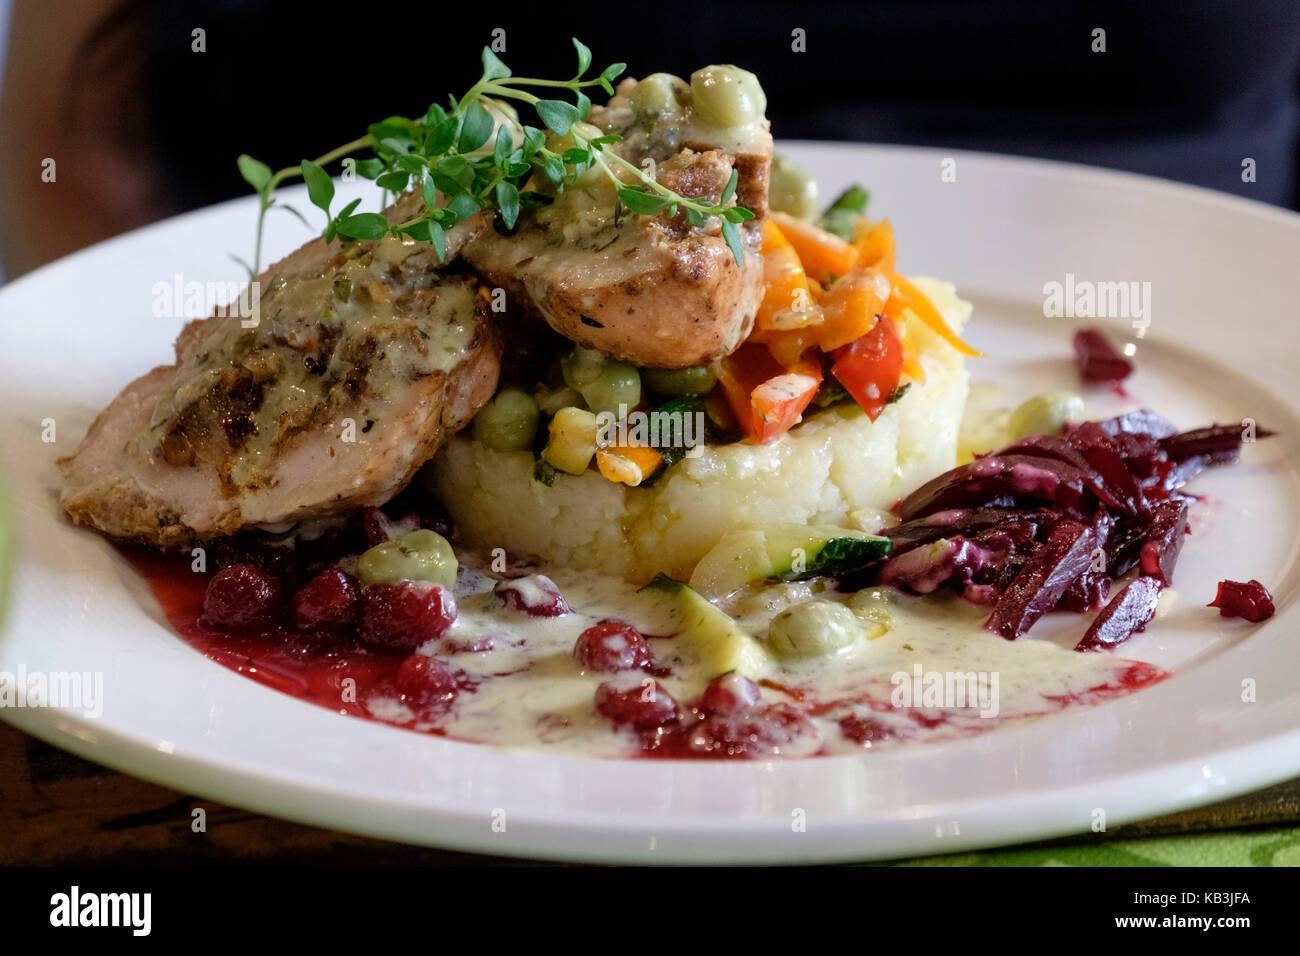 Haute cuisine plate stock photos haute cuisine plate for Haute cuisine